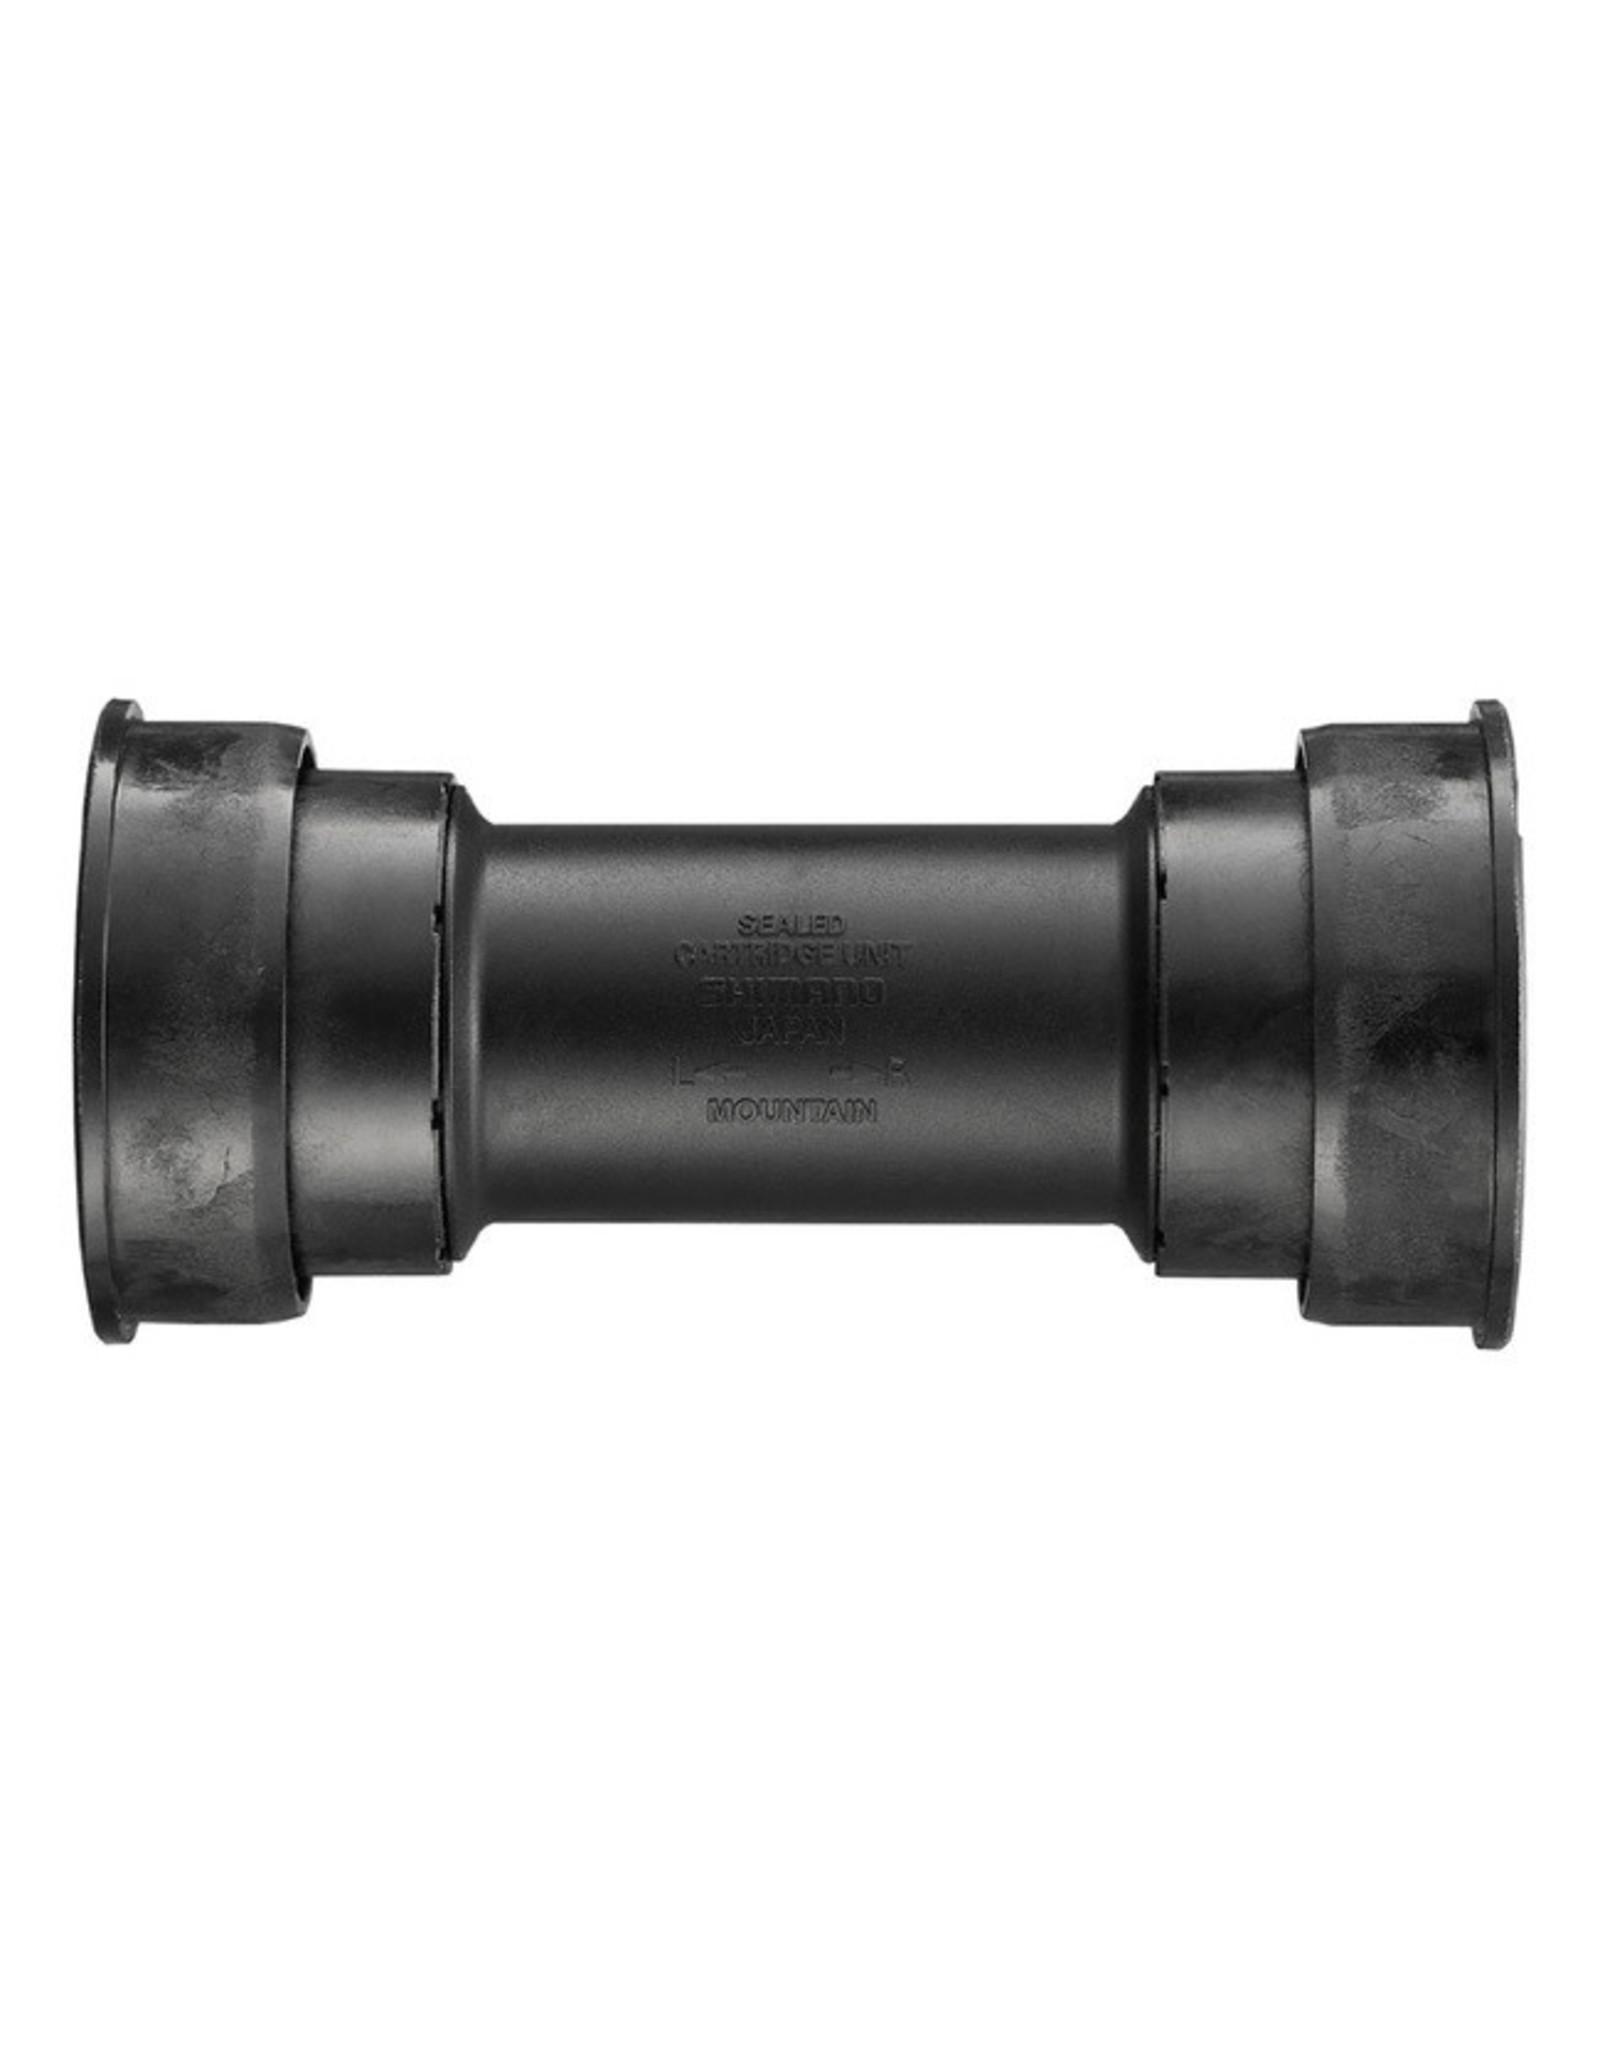 Shimano Bottom bracket Shim press-fit BB94-41A XTR 89.5/92x41mm (MTB)